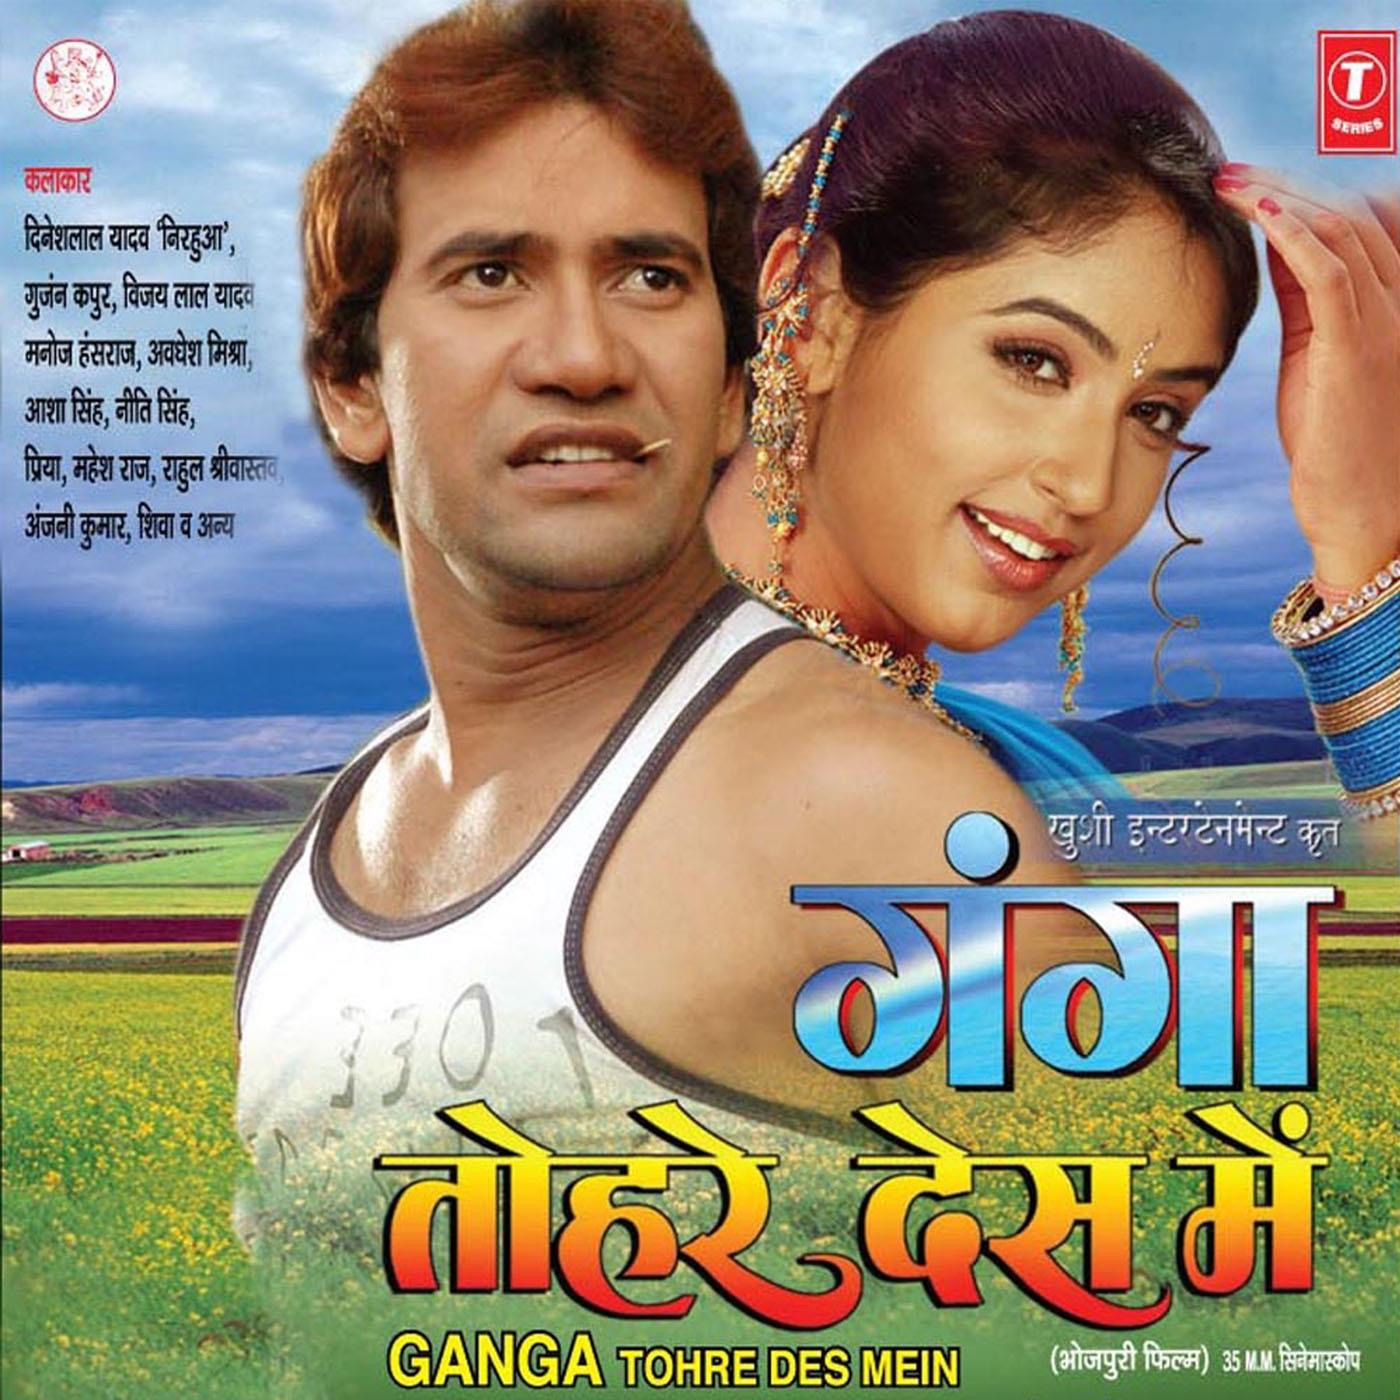 Ganga Tohre Des Mein (Original Motion Picture Soundtrack)